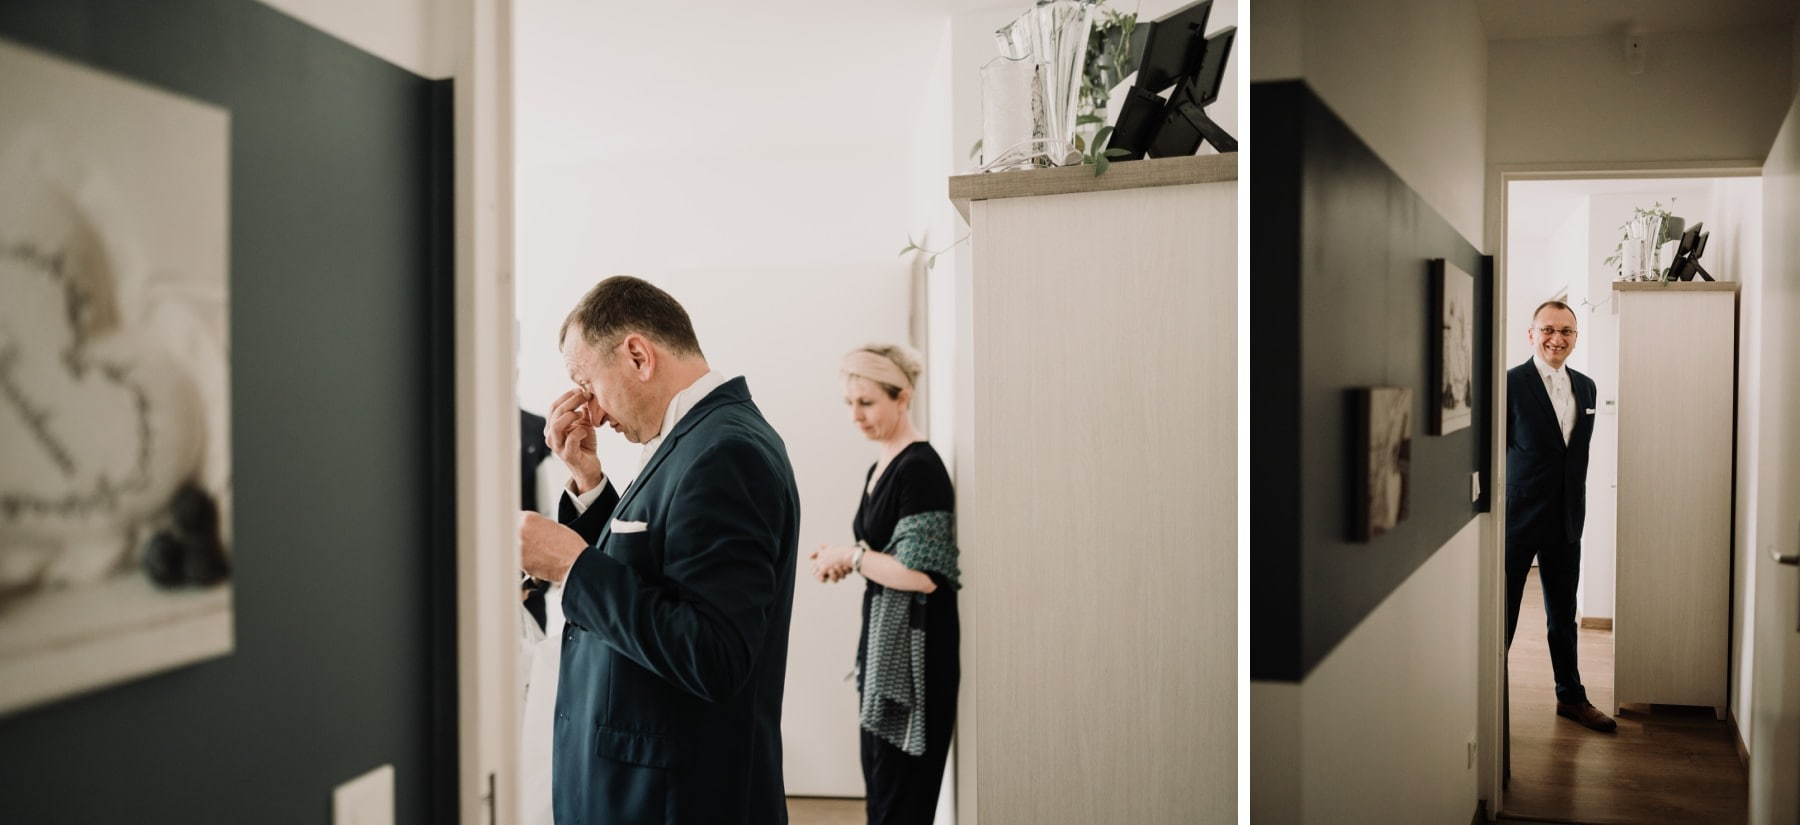 mariage intimiste a paris